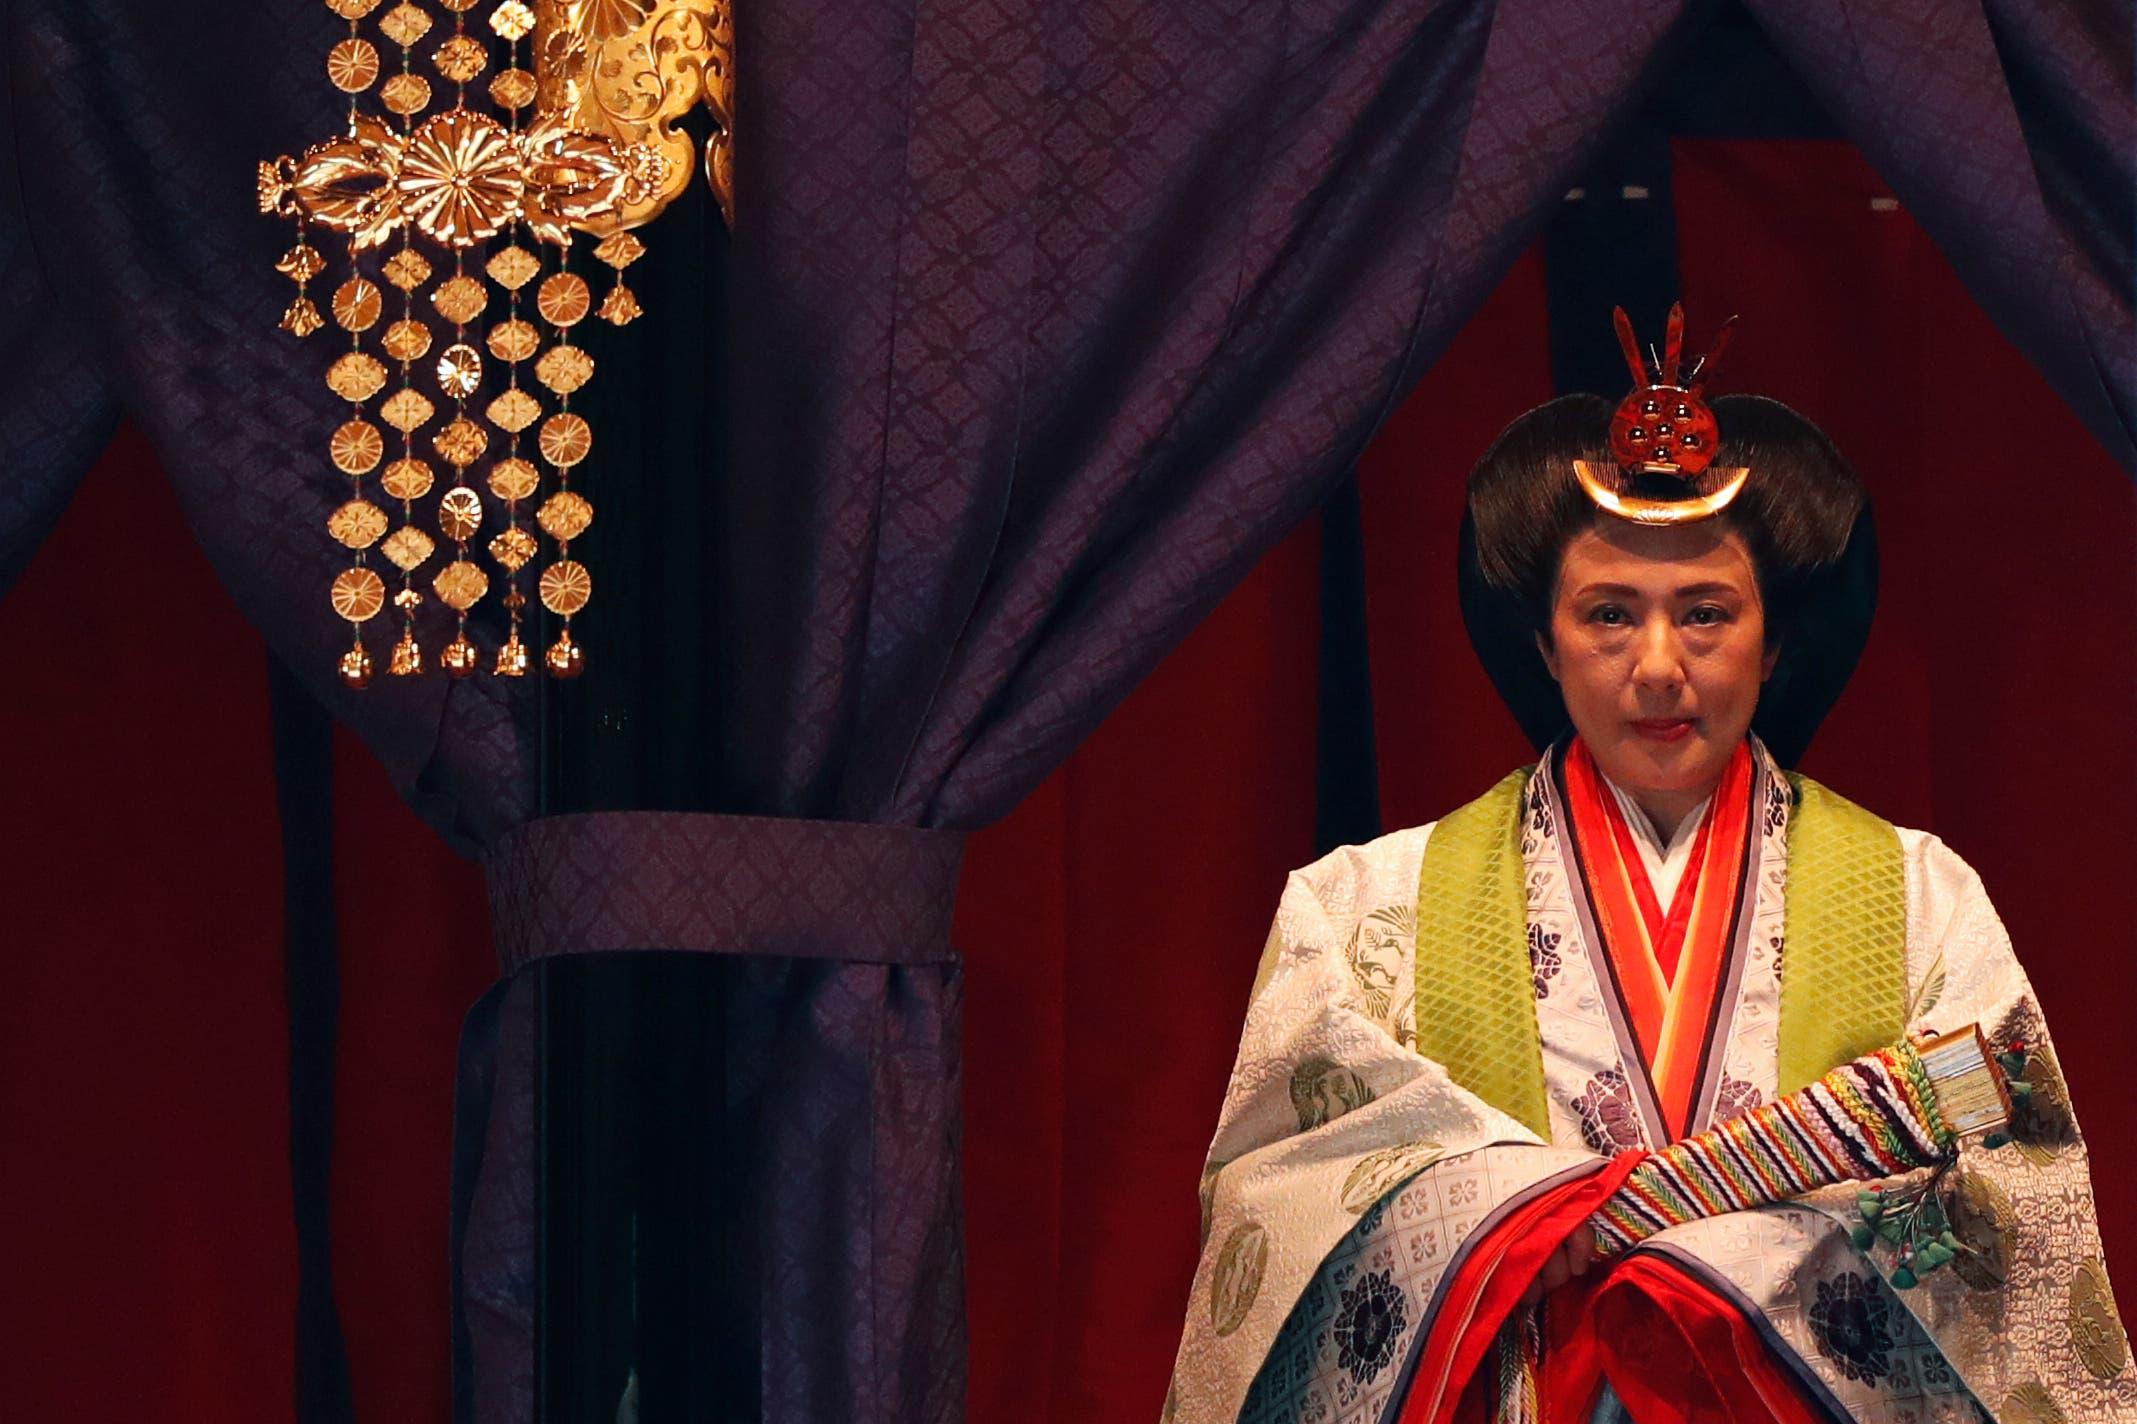 Masako in Naurhito ceremony - AFP